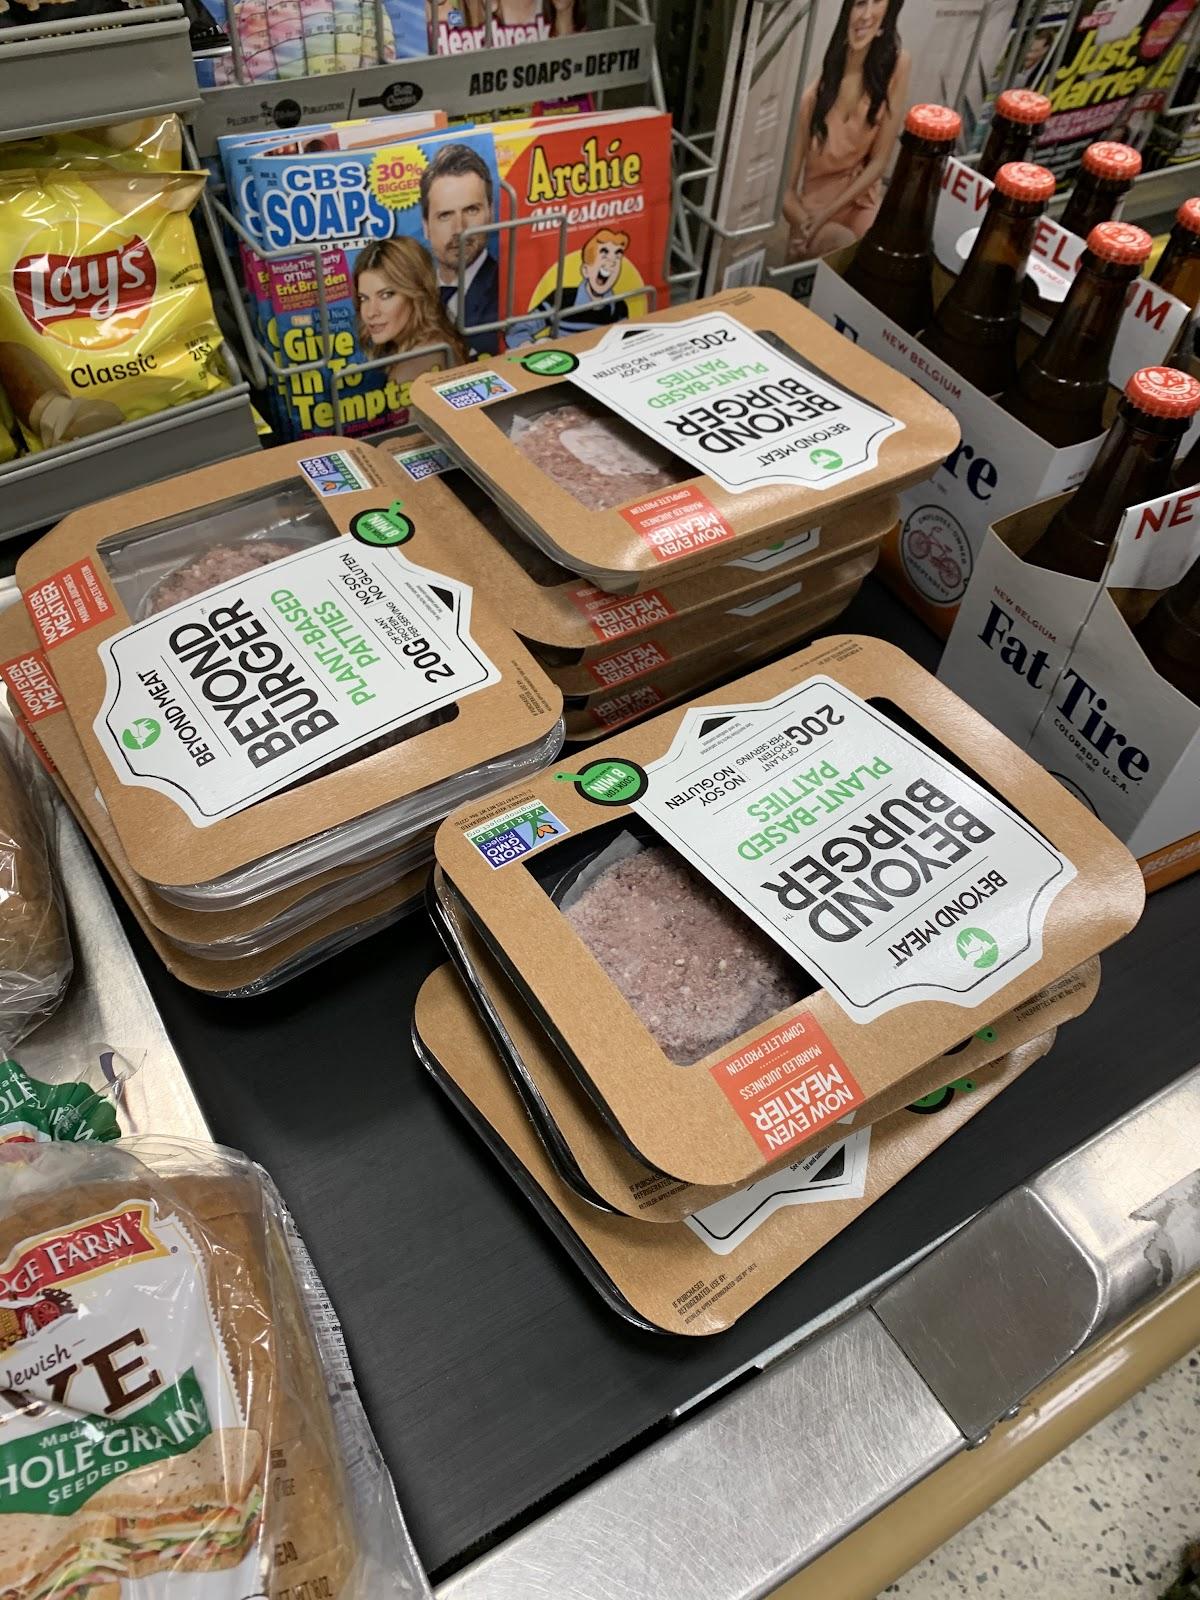 Stocking up on the Beyond Meat's vegan burger during a Publix BOGO sale.